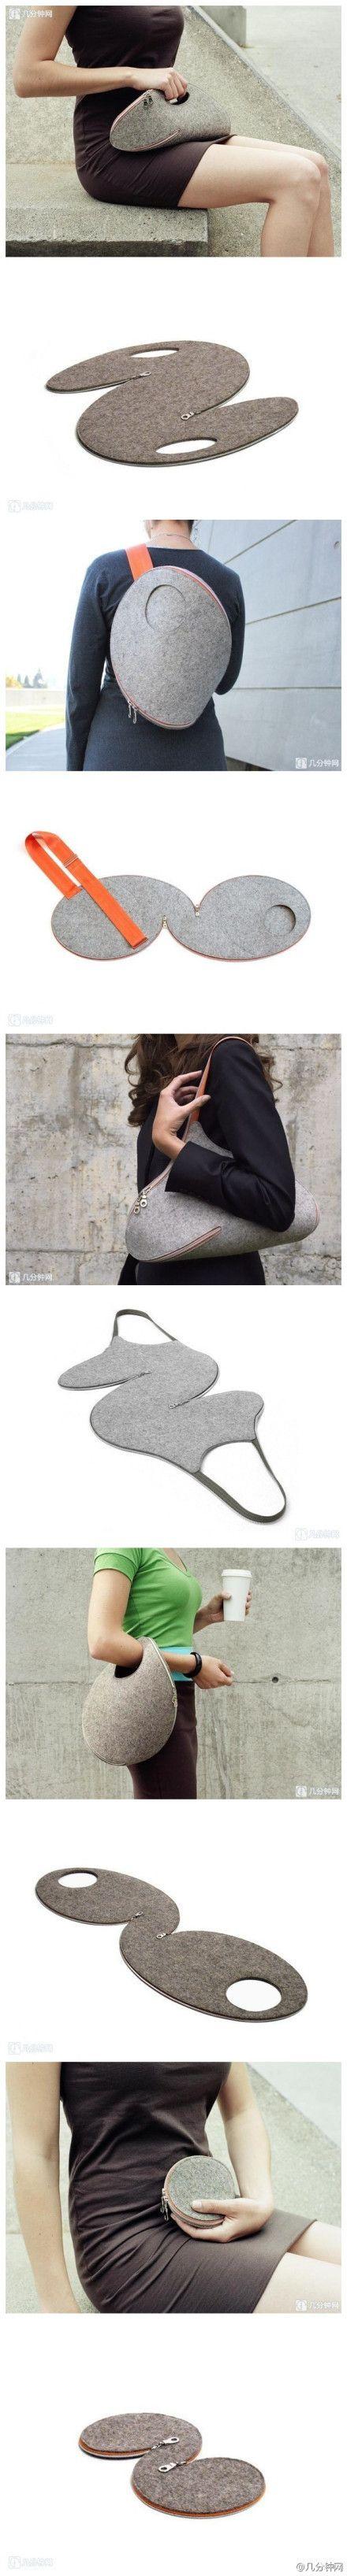 DIY Cool Lady Bag DIY Projects